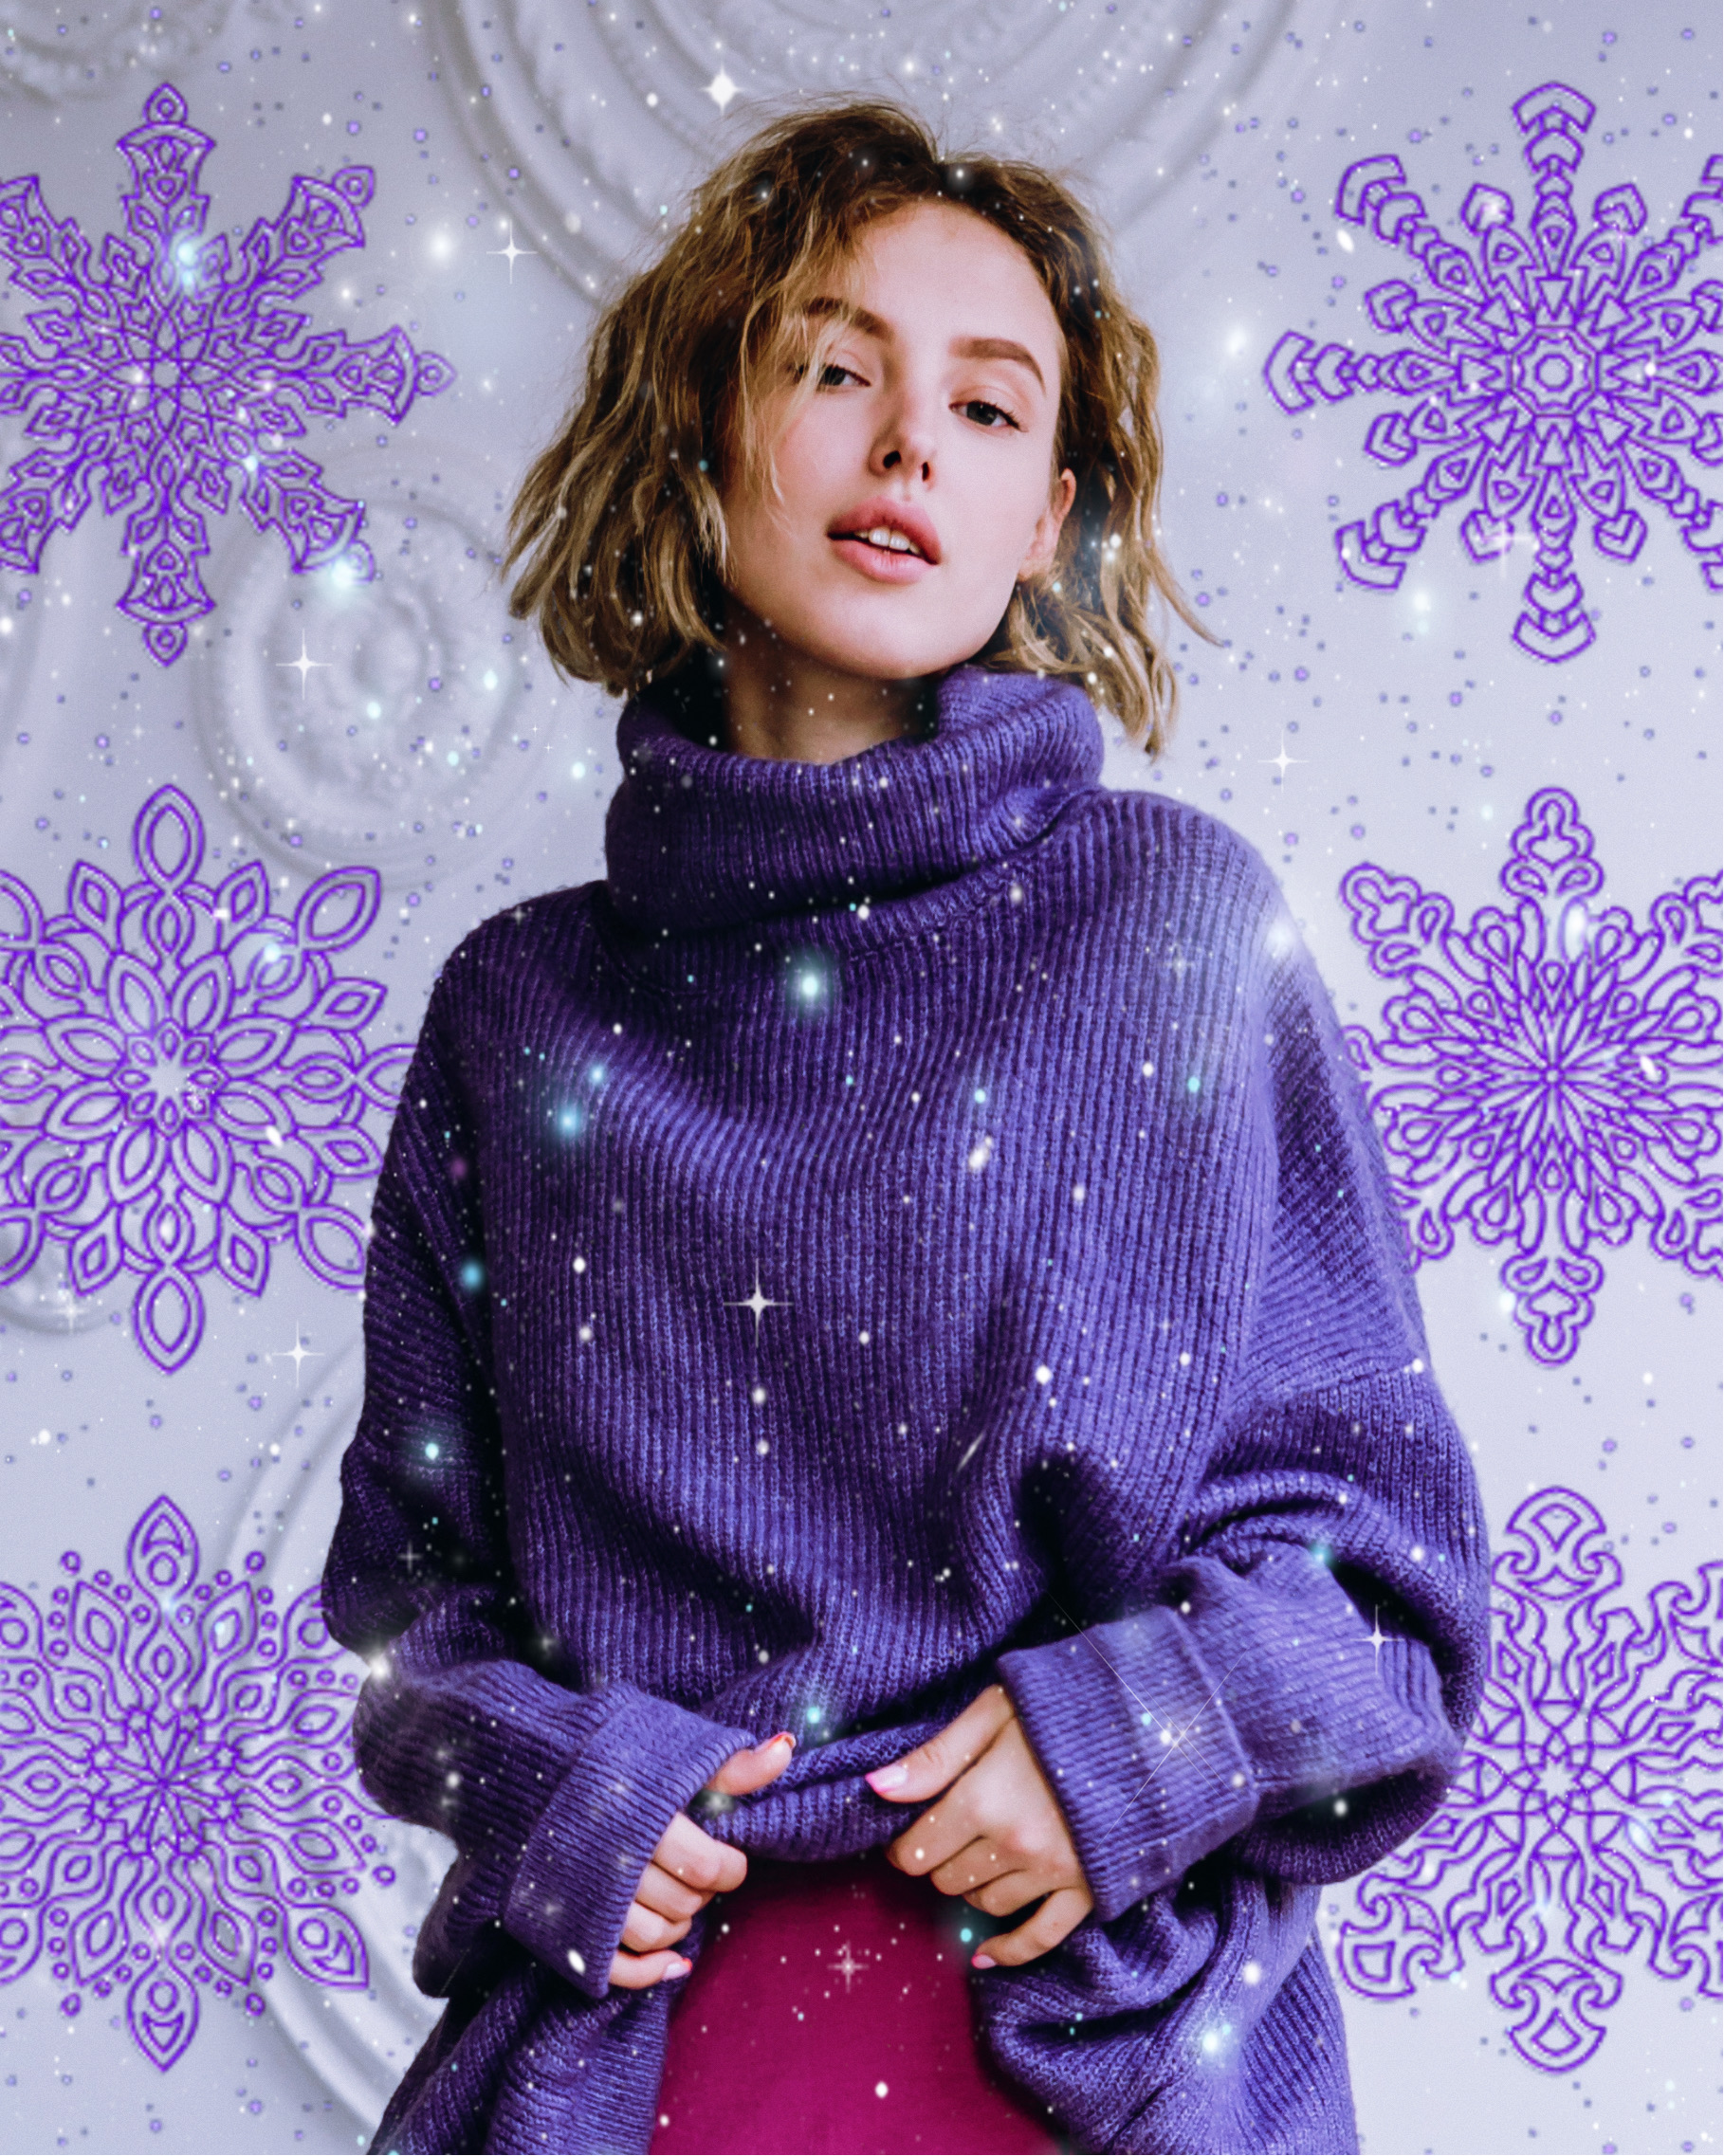 #freetoedit #snowflake #snowflakes #decor #holiday #holidays #holidaydecor #christmas #sparkles #winter #wintervibes